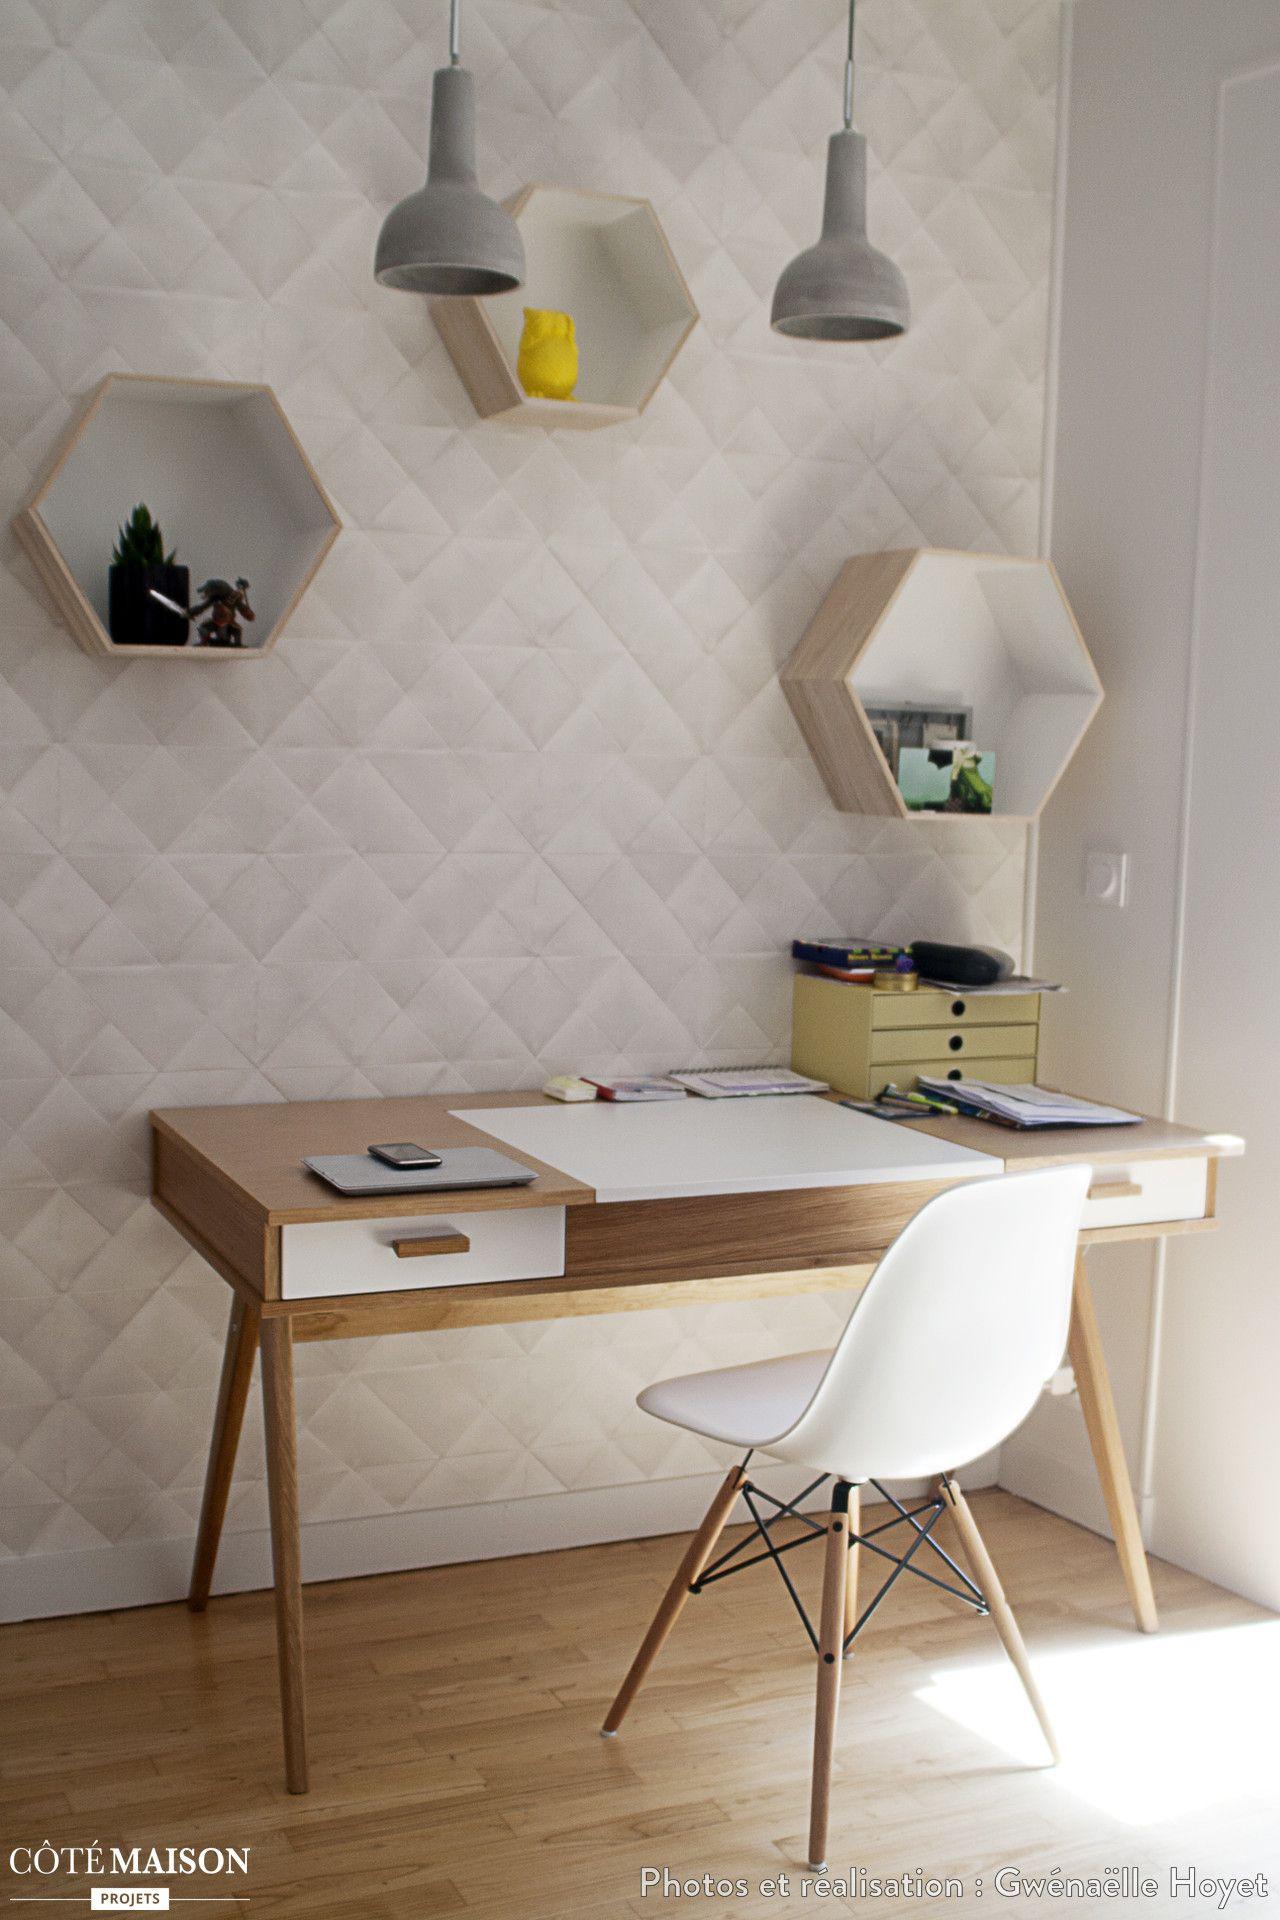 Bureau Moderne A L Esprit Scandinave Design D Interieur In 2018